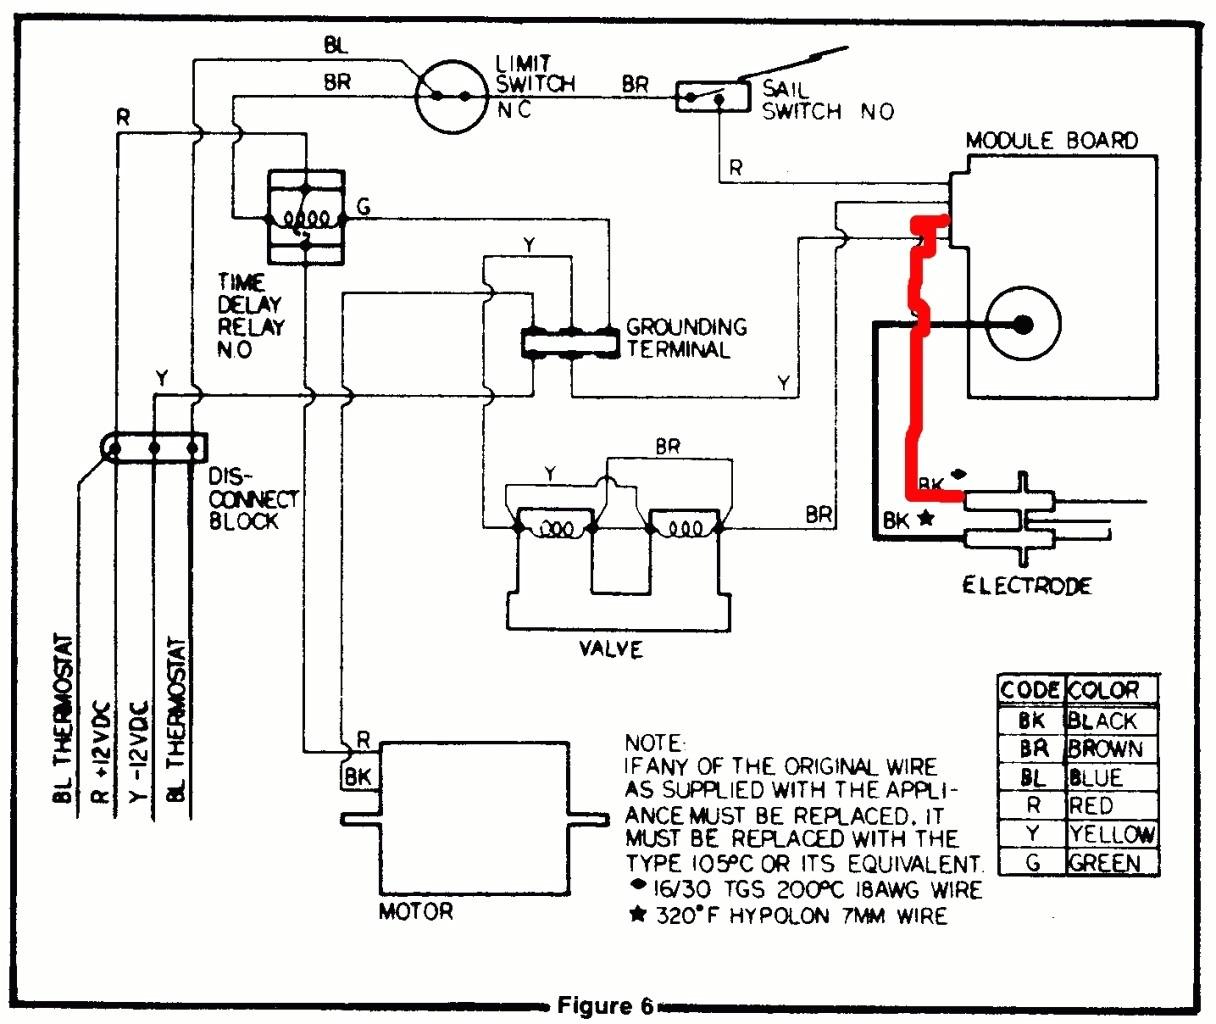 rv microwave wiring diagram wiring diagram browse rv heater wiring blog wiring diagram rv microwave wiring